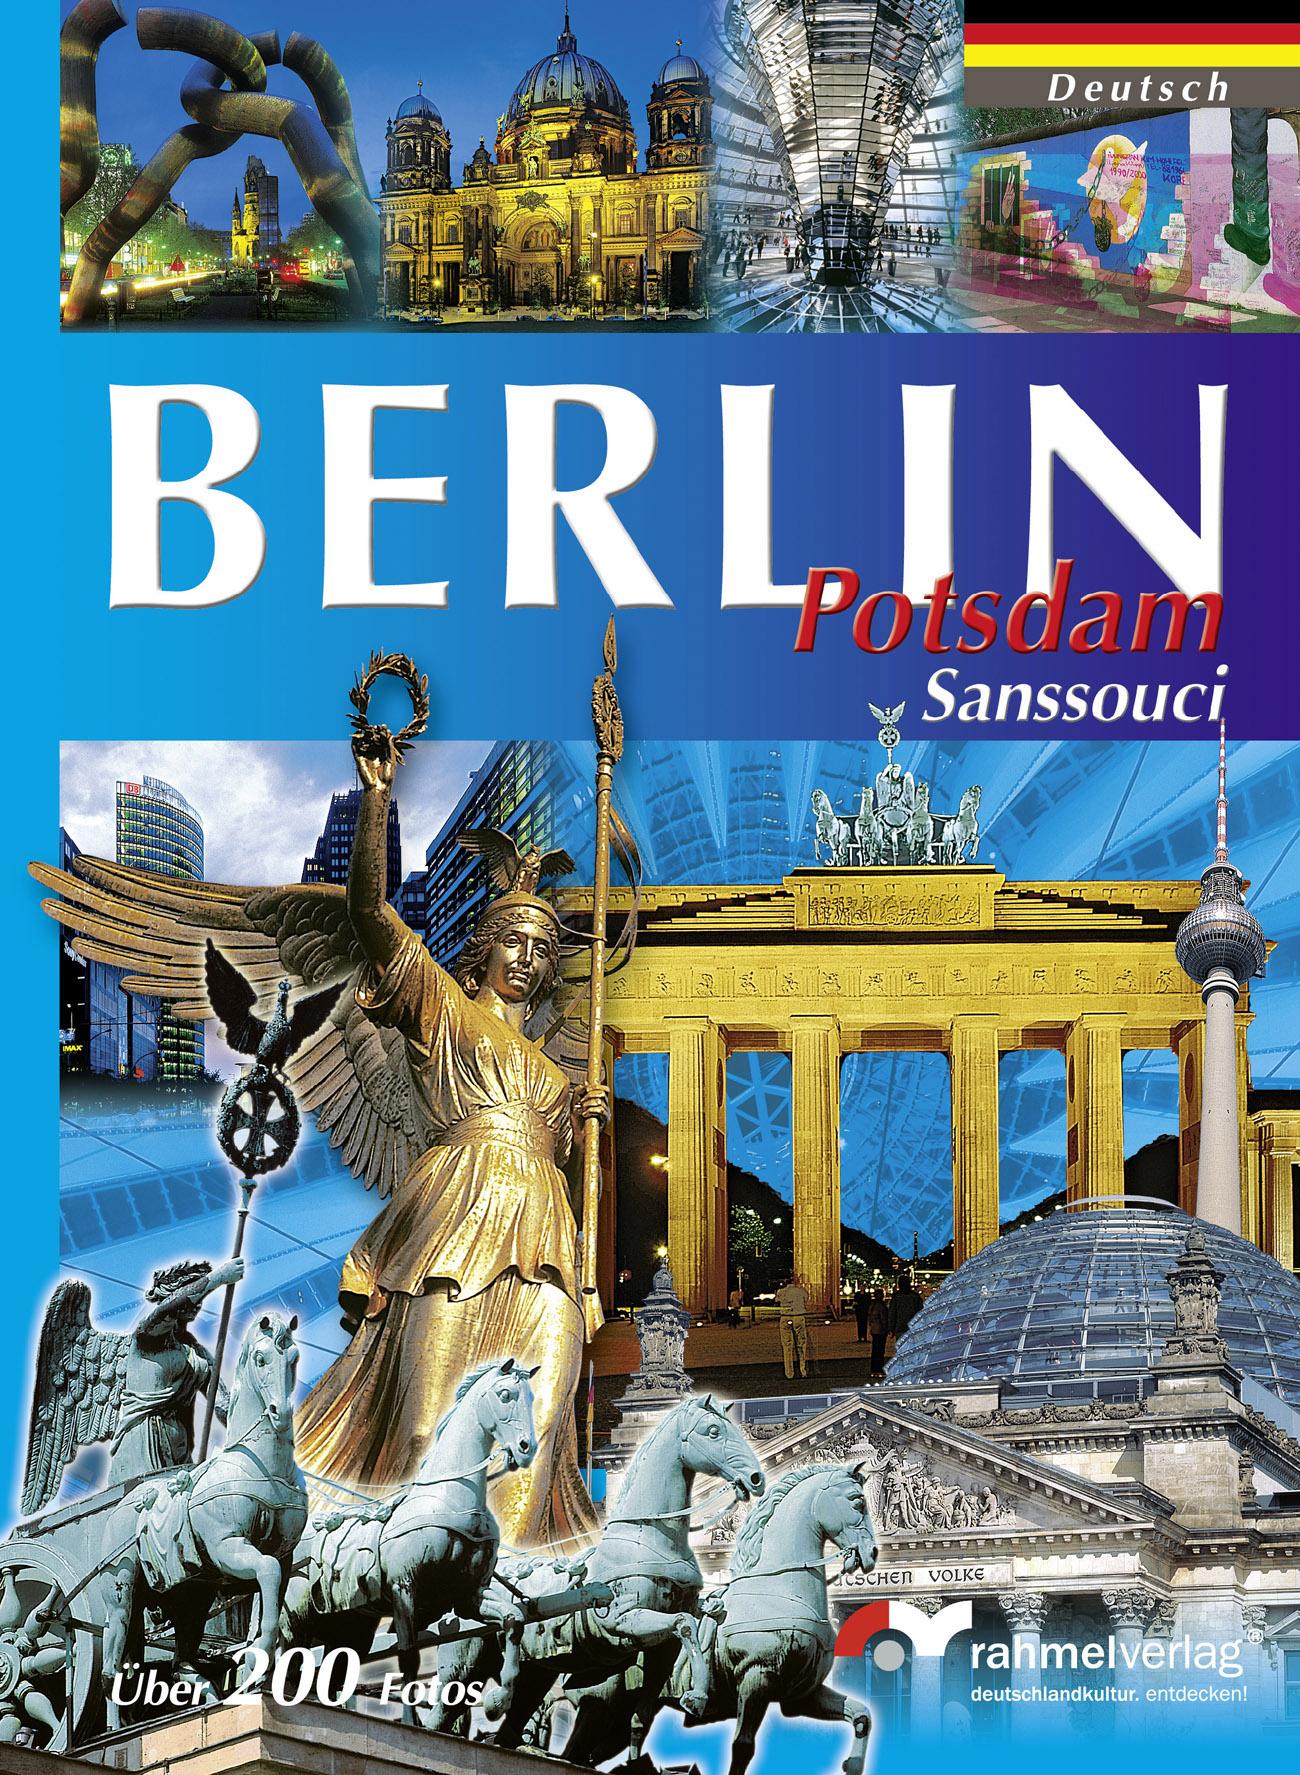 XXL-Book Berlin (deutsche Ausgabe) - Potsdam Sa...